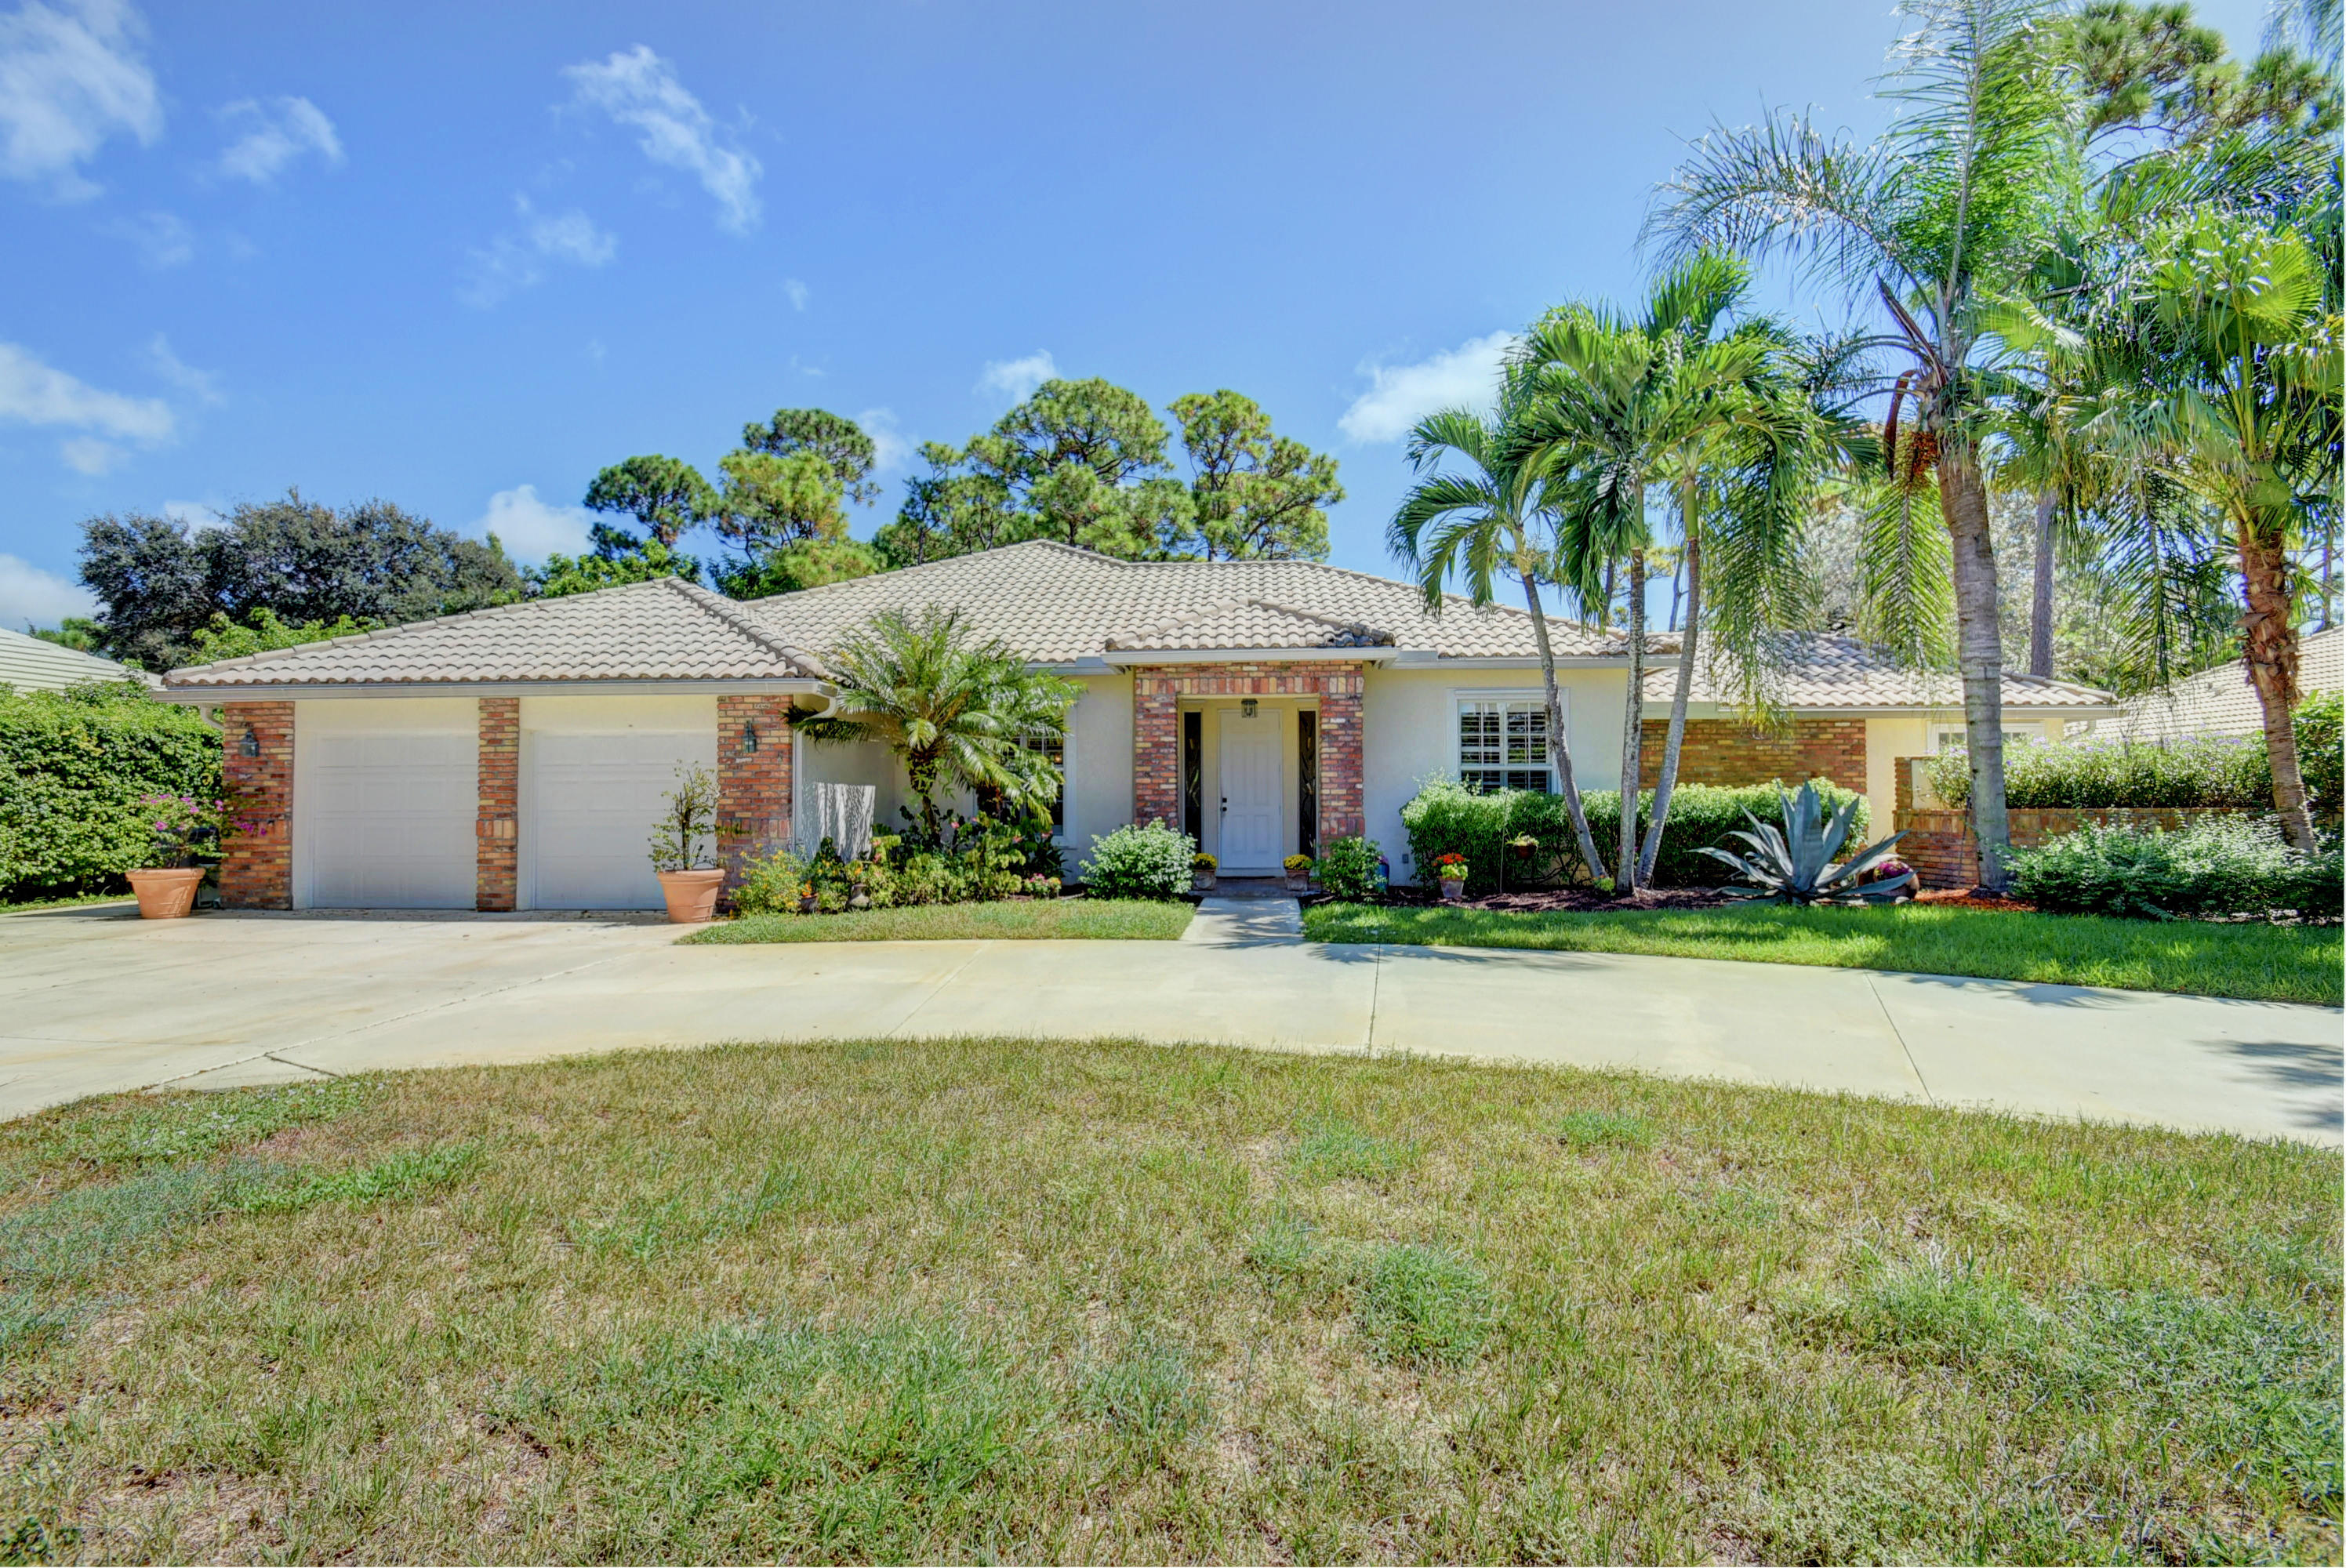 11564 Dunes Road Boynton Beach, FL 33436